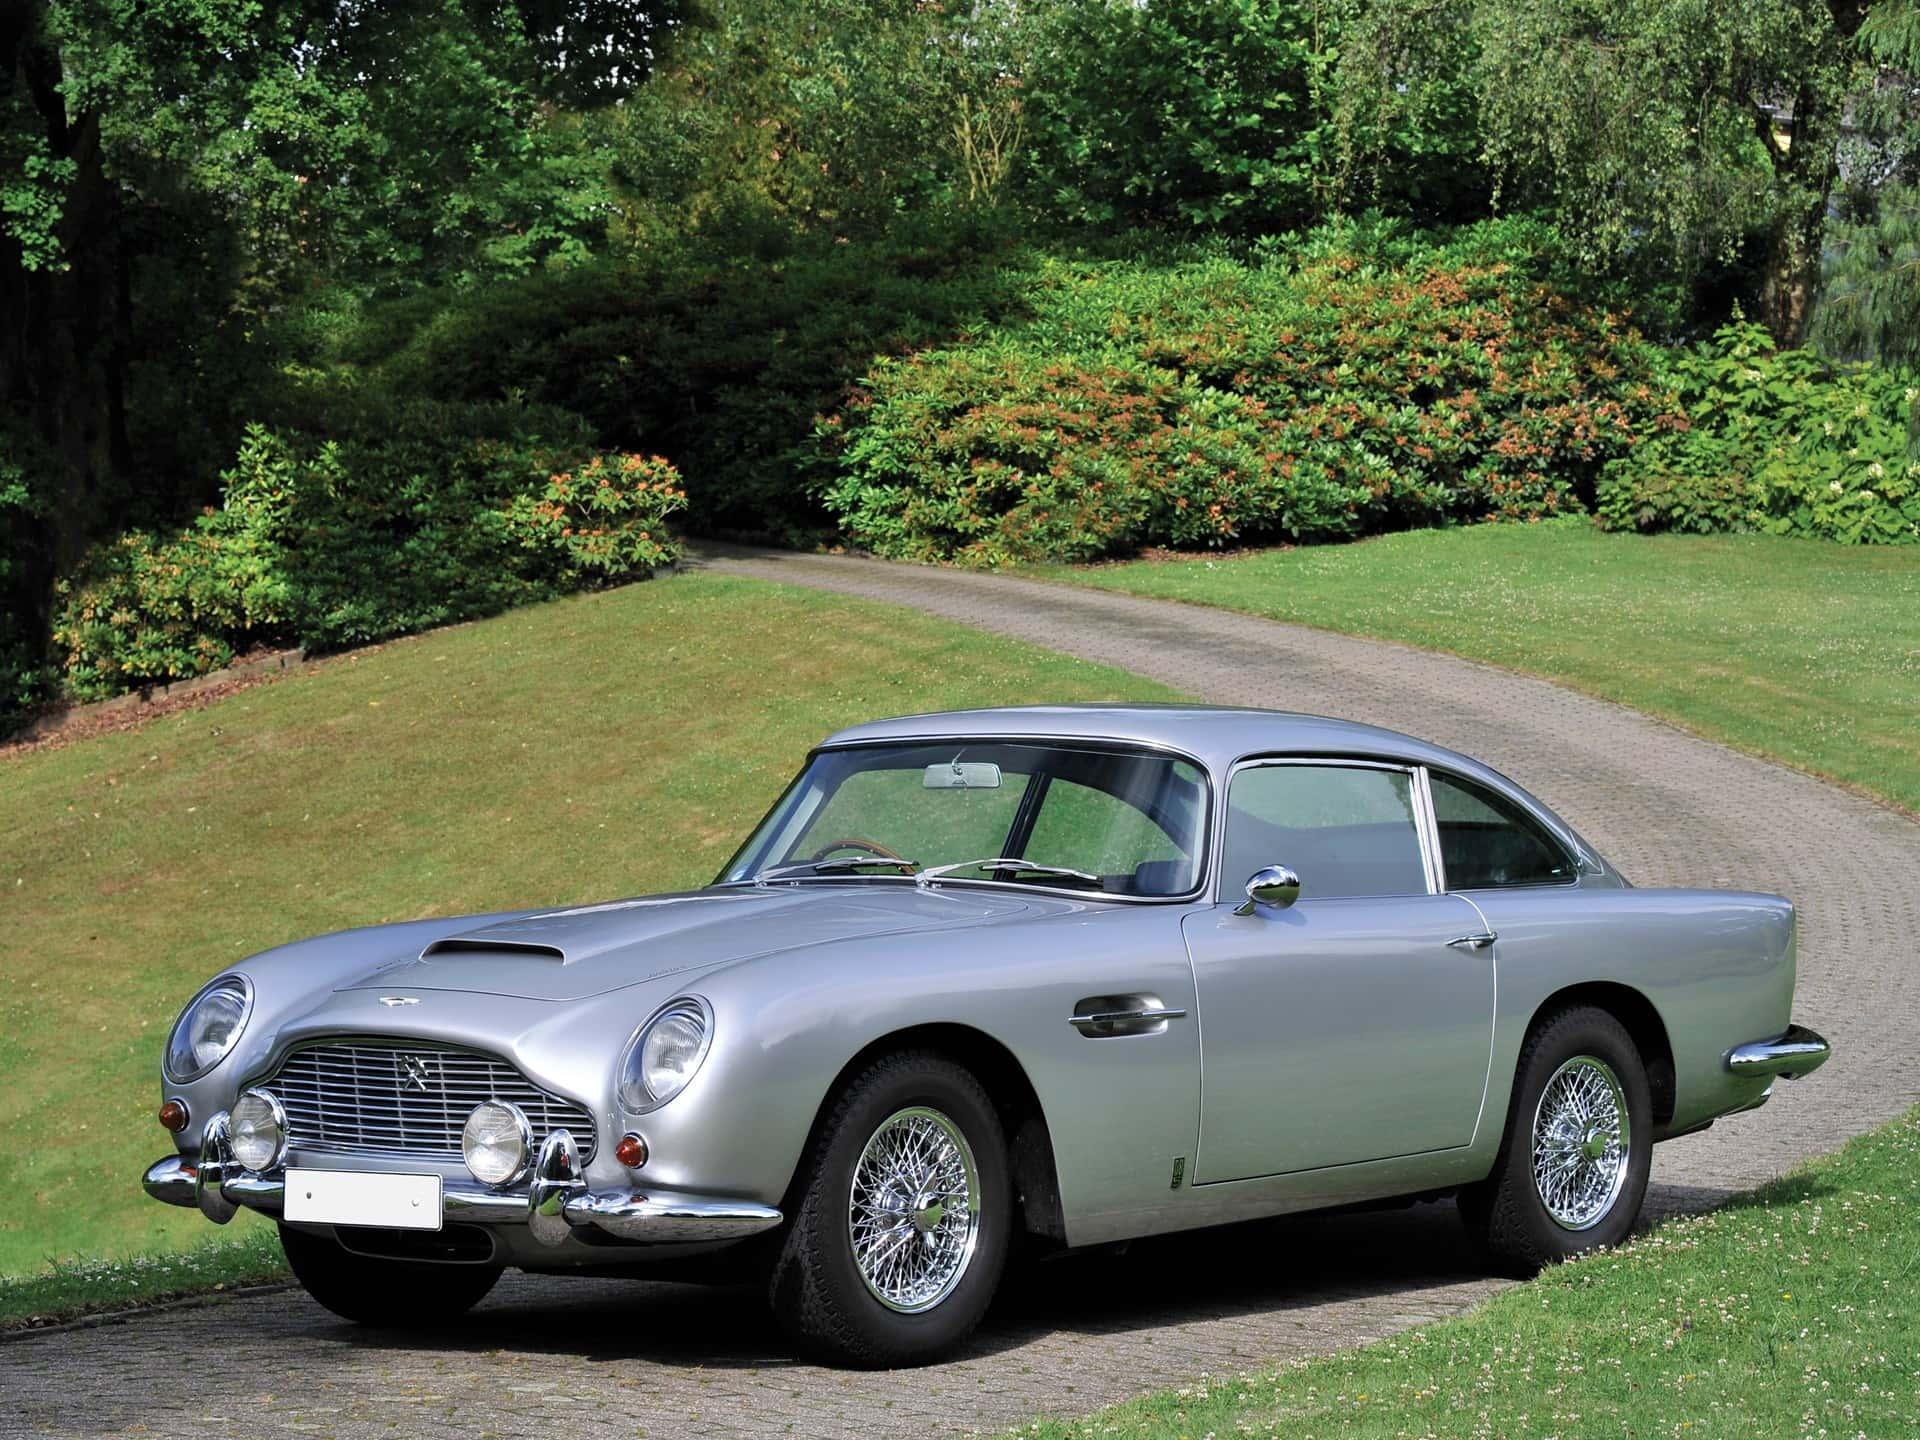 1964 Aston Martin DB5 Vantage Coupe